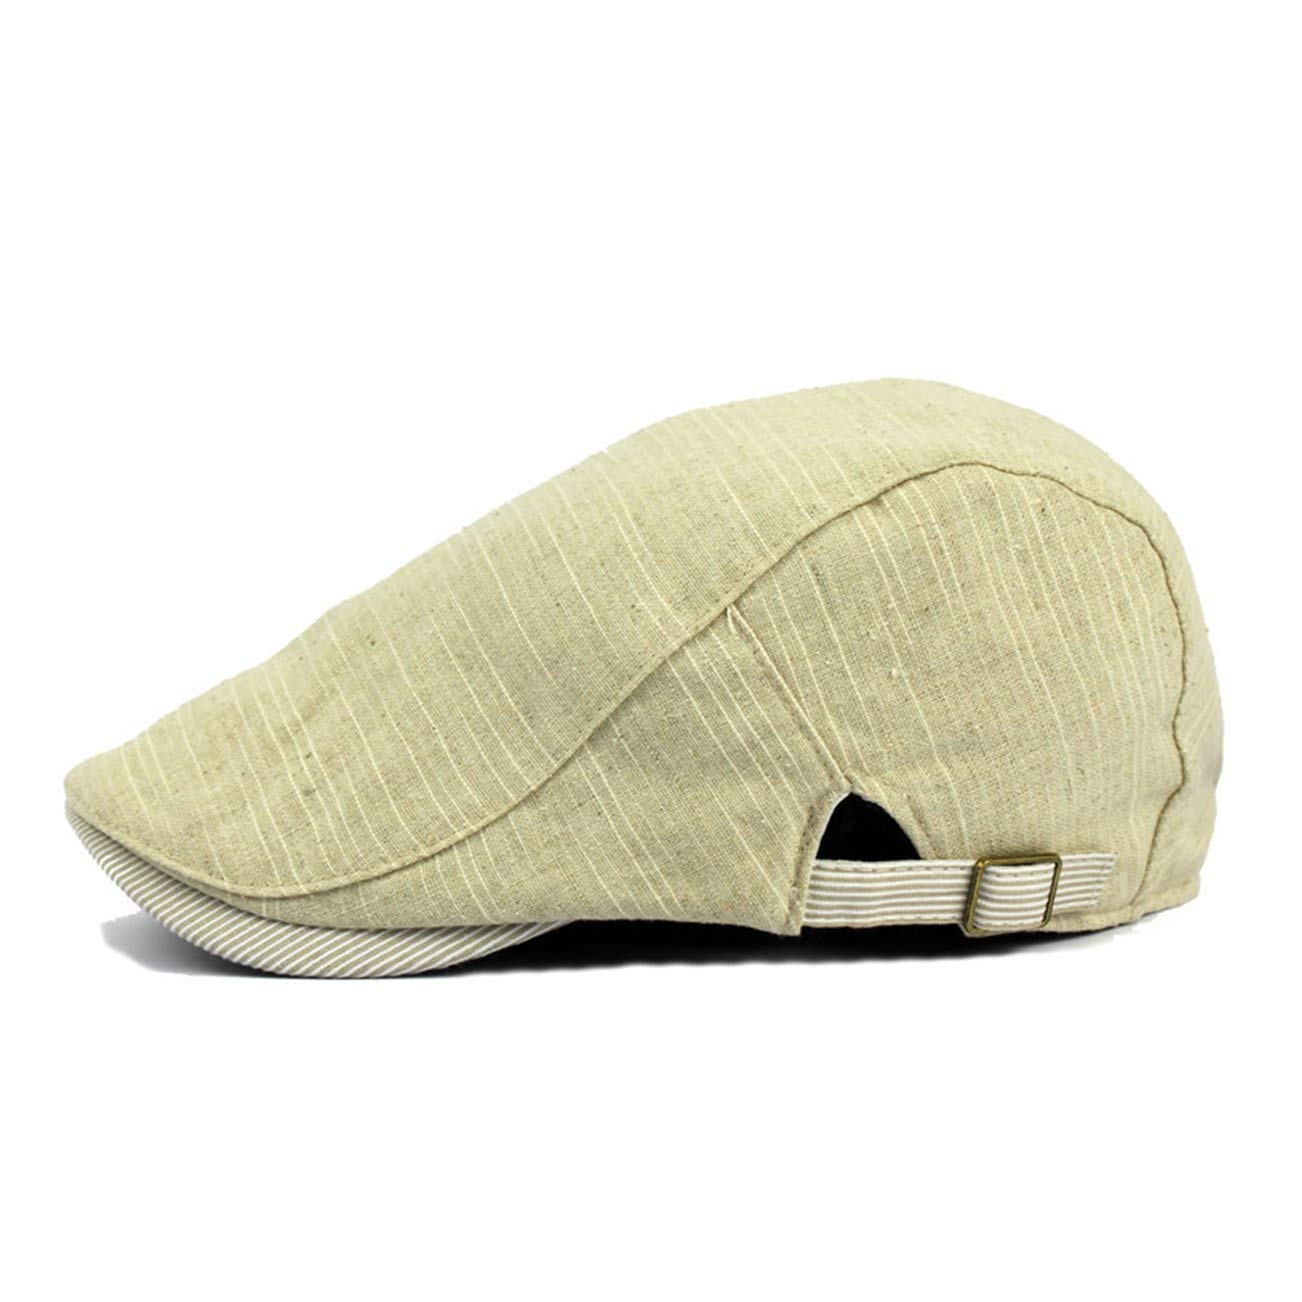 Get Quotations · Eohak Flat Linen Ivy Cap - Unisex Cabbie Hat Breathable Driving  Hat Vintage Casual ef242d3db3a6